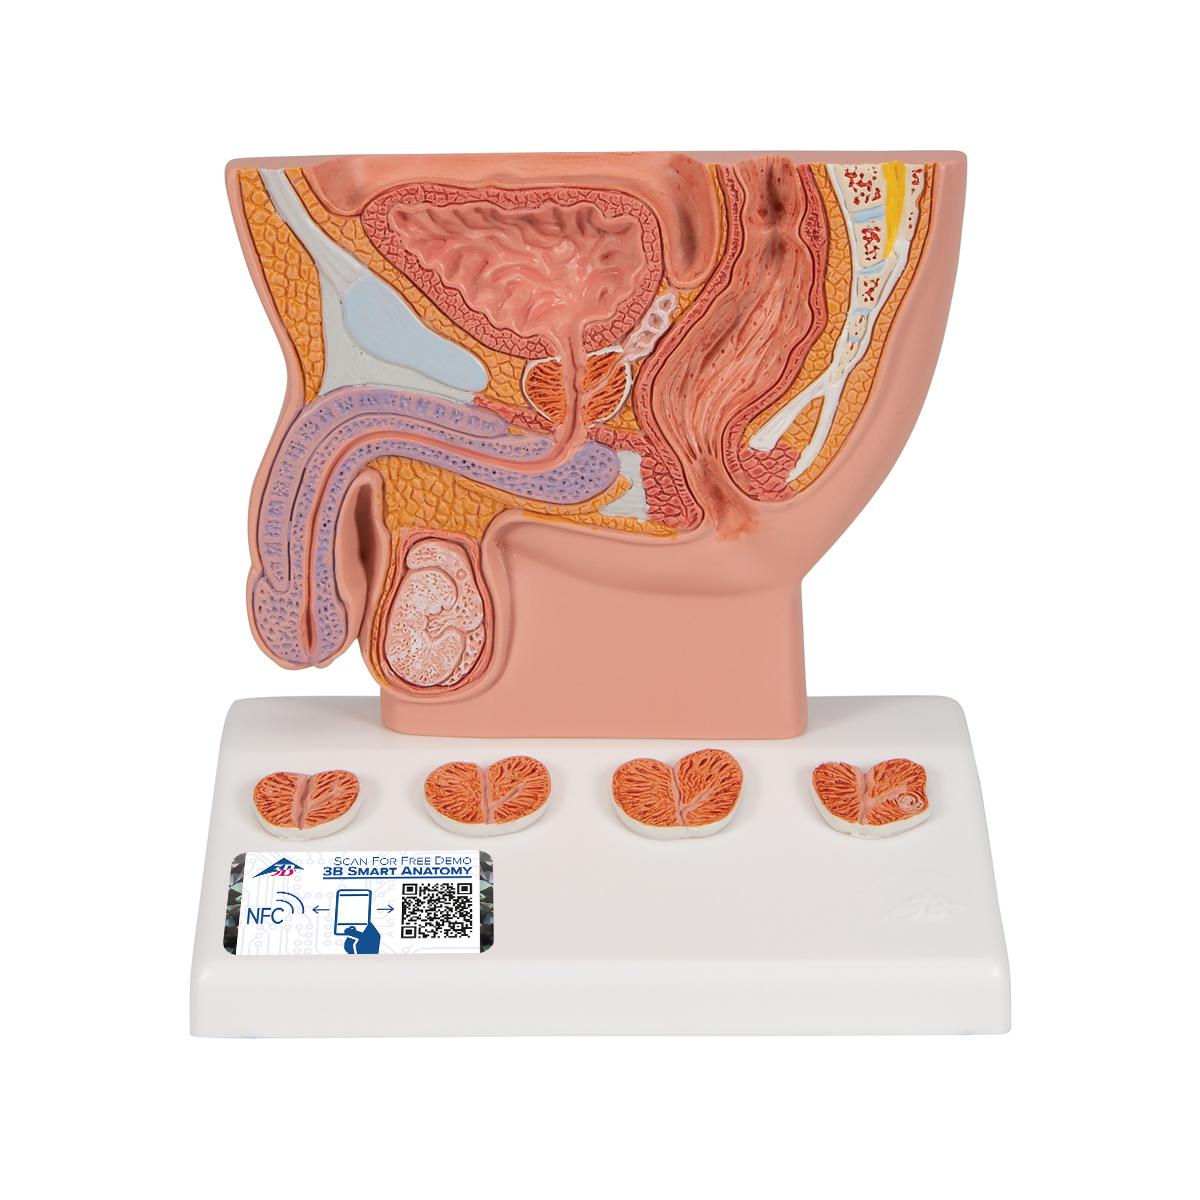 Anatomical Teaching Model Mens Health Education Models Plastic